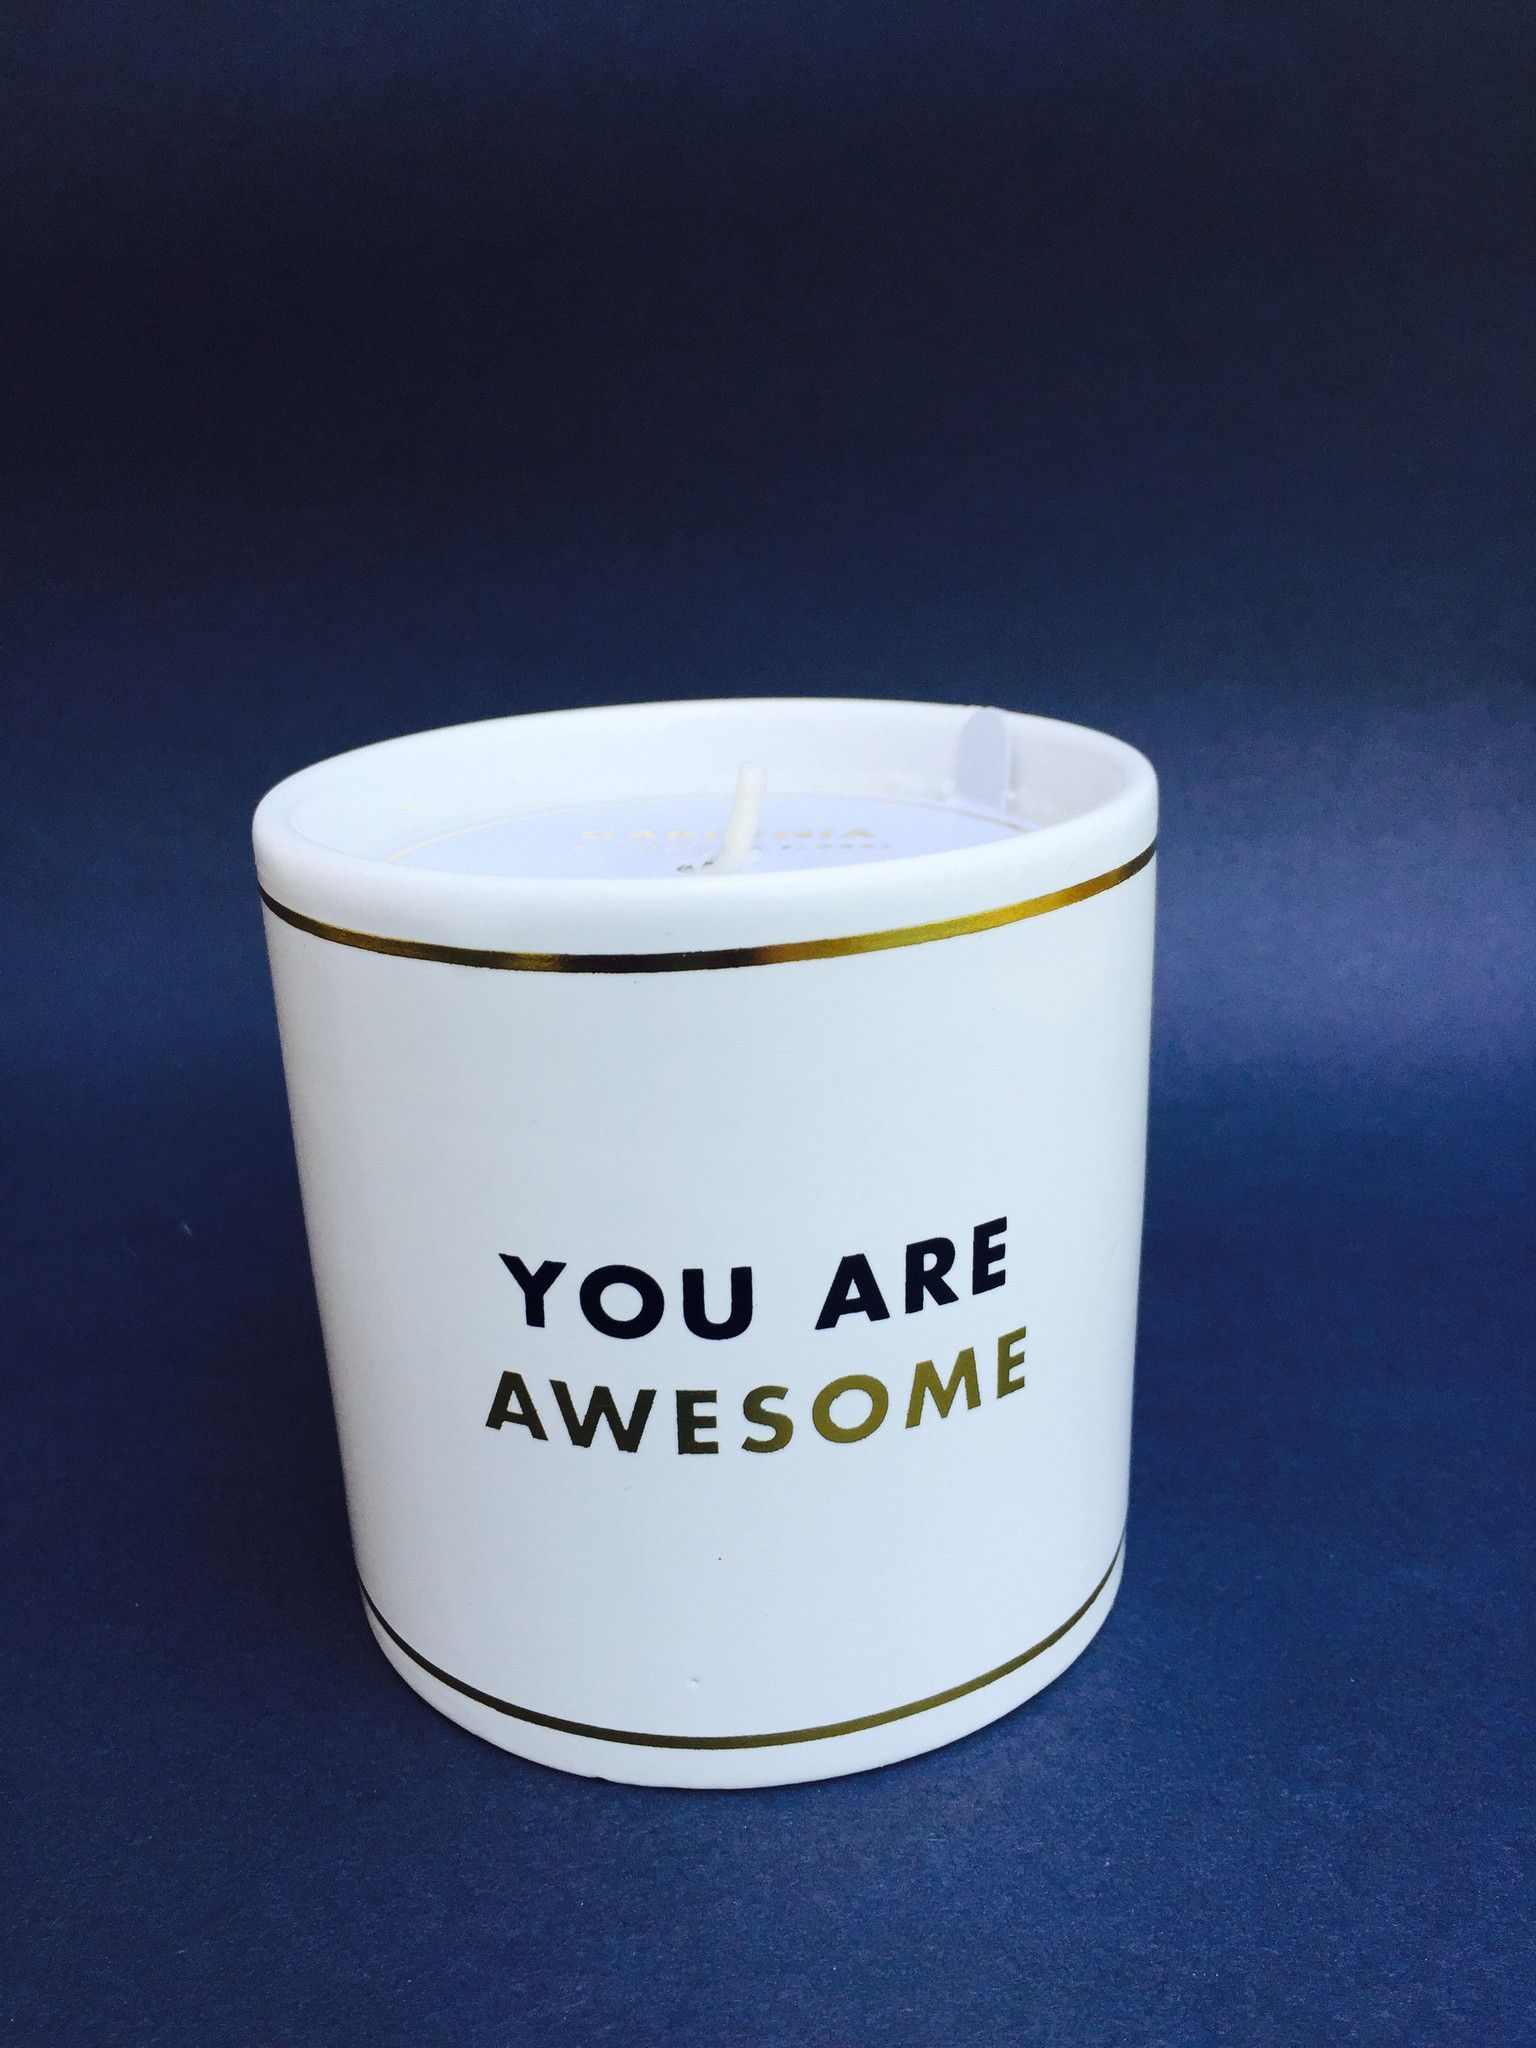 Motivational Candles